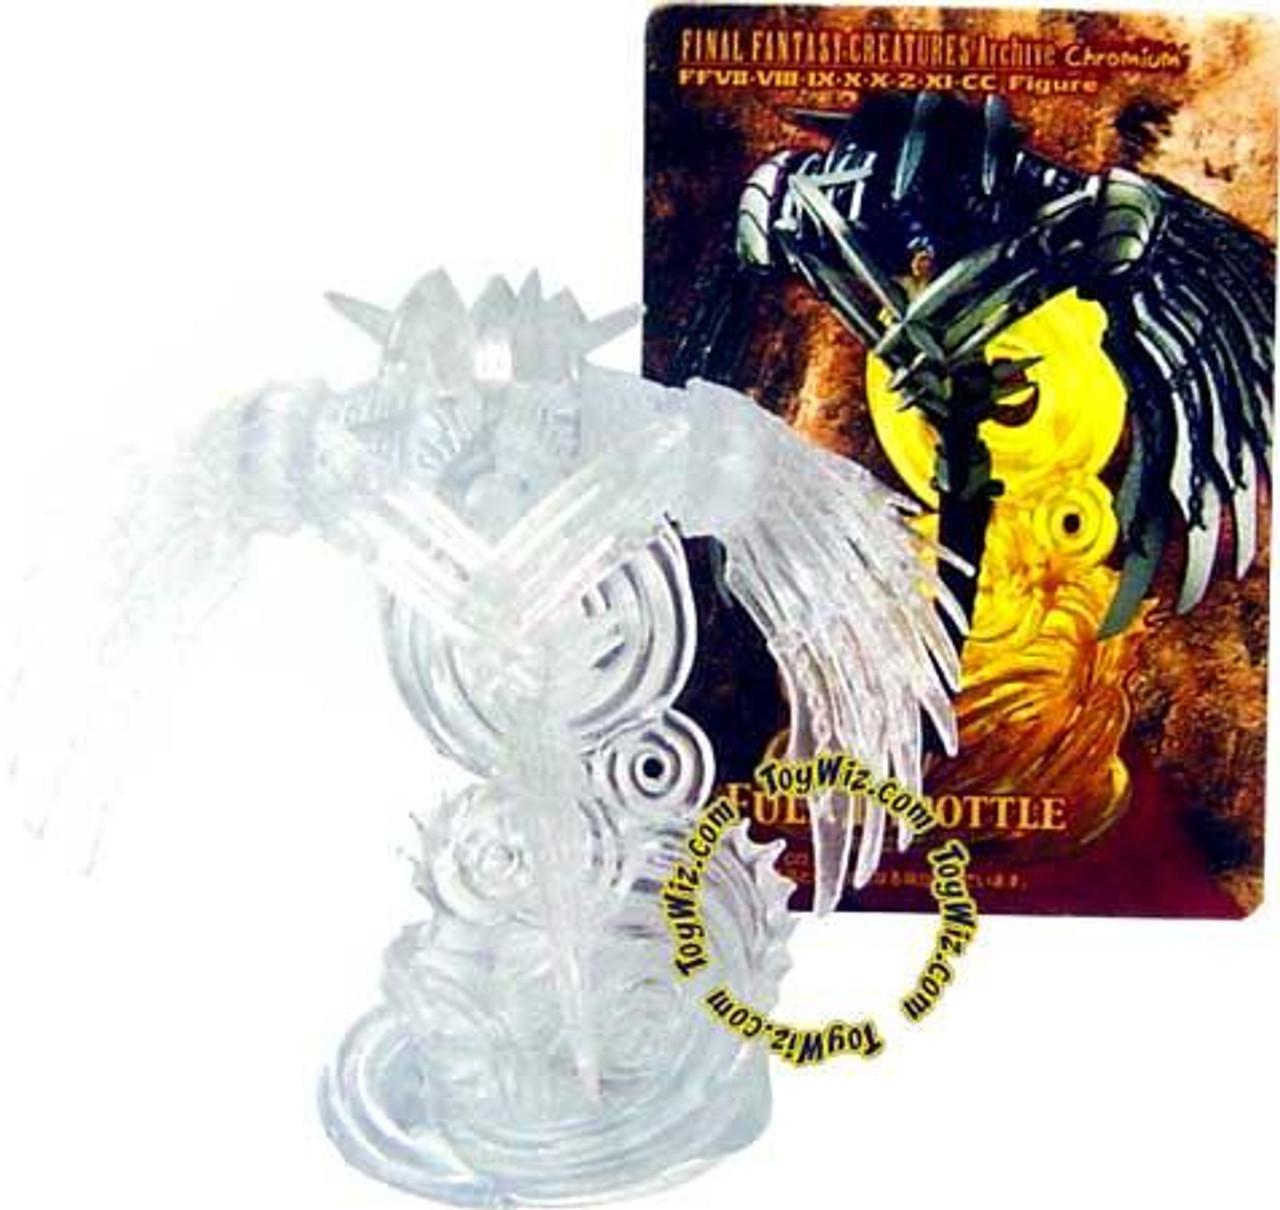 Final Fantasy Creatures Archive Chromium Full Throttle PVC Figure #45 [Crystal]